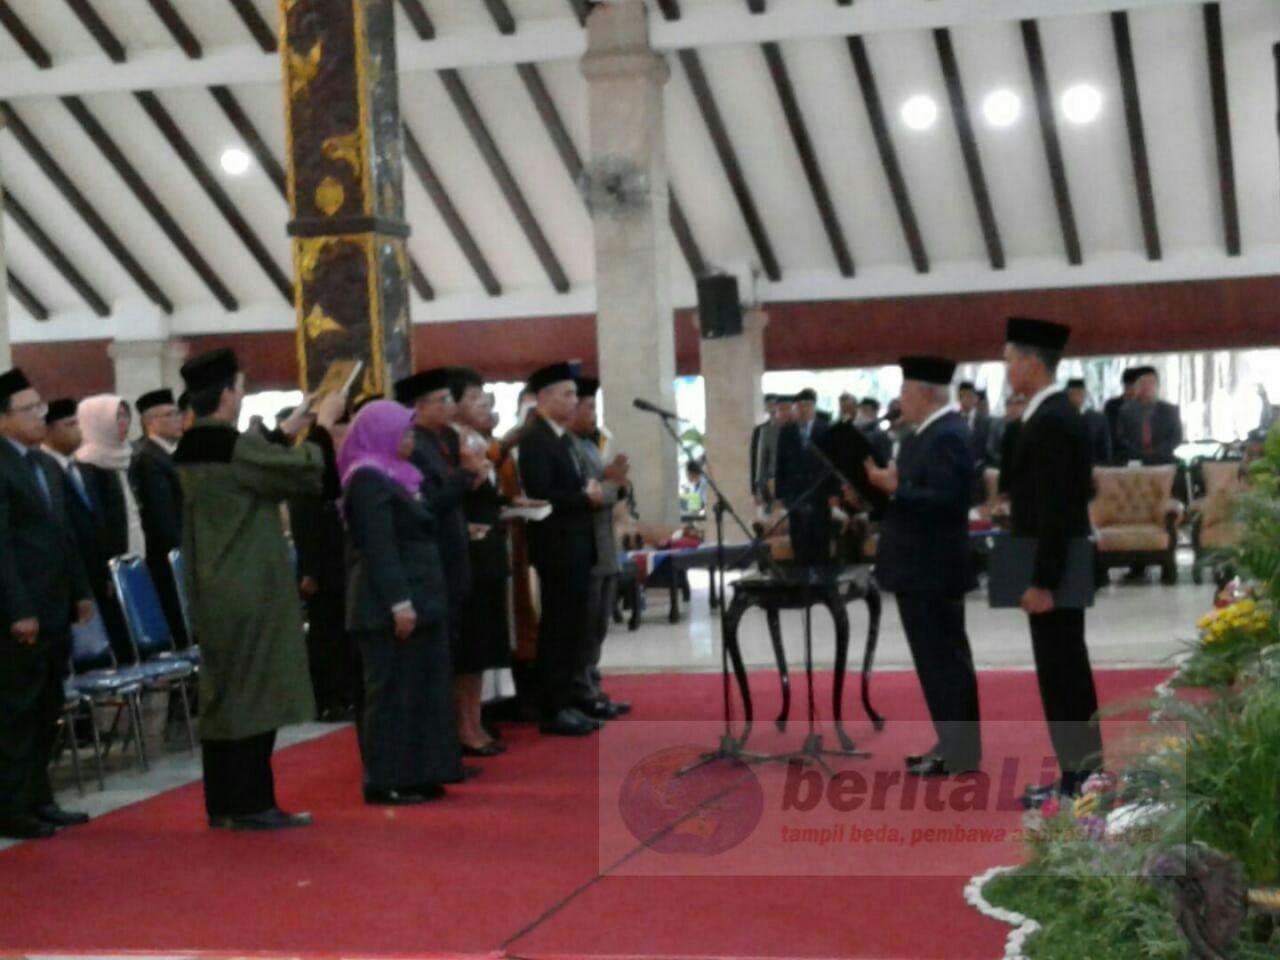 DPRD Kabupaten Malang 'Buka Suara' Soal Mutasi Ilegal